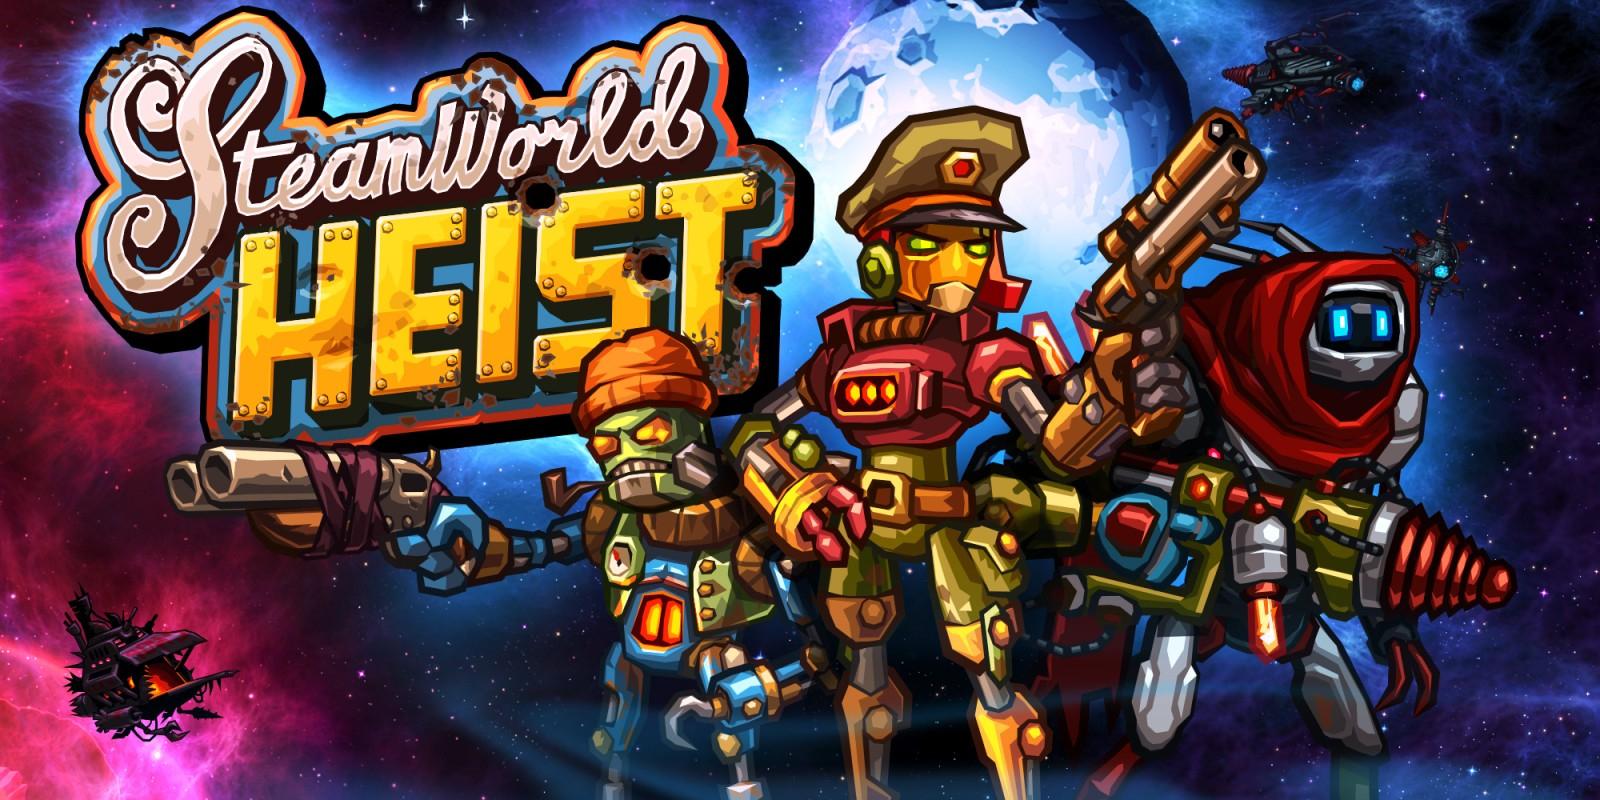 Steamworld Heist: Ultimate Edition for Nintendo Switch £4.49 @ Nintendo Shop